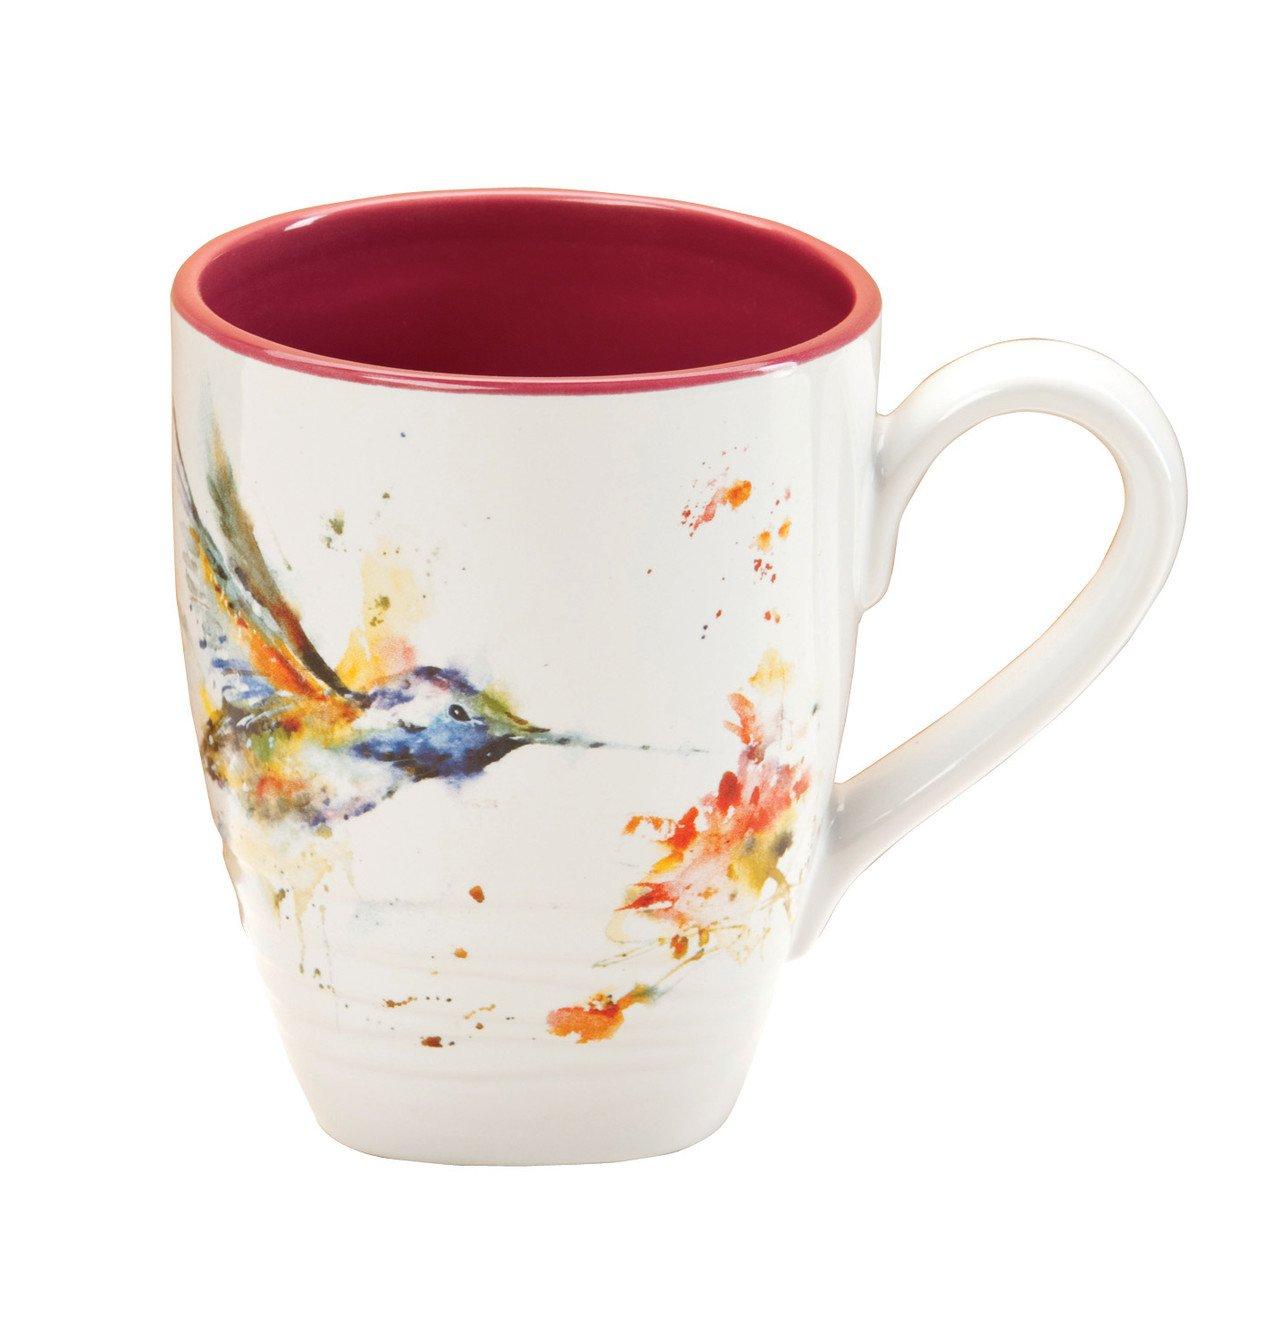 DEMDACO B5050124 Big Sky Carvers Hummingbird Mug, Multicolored